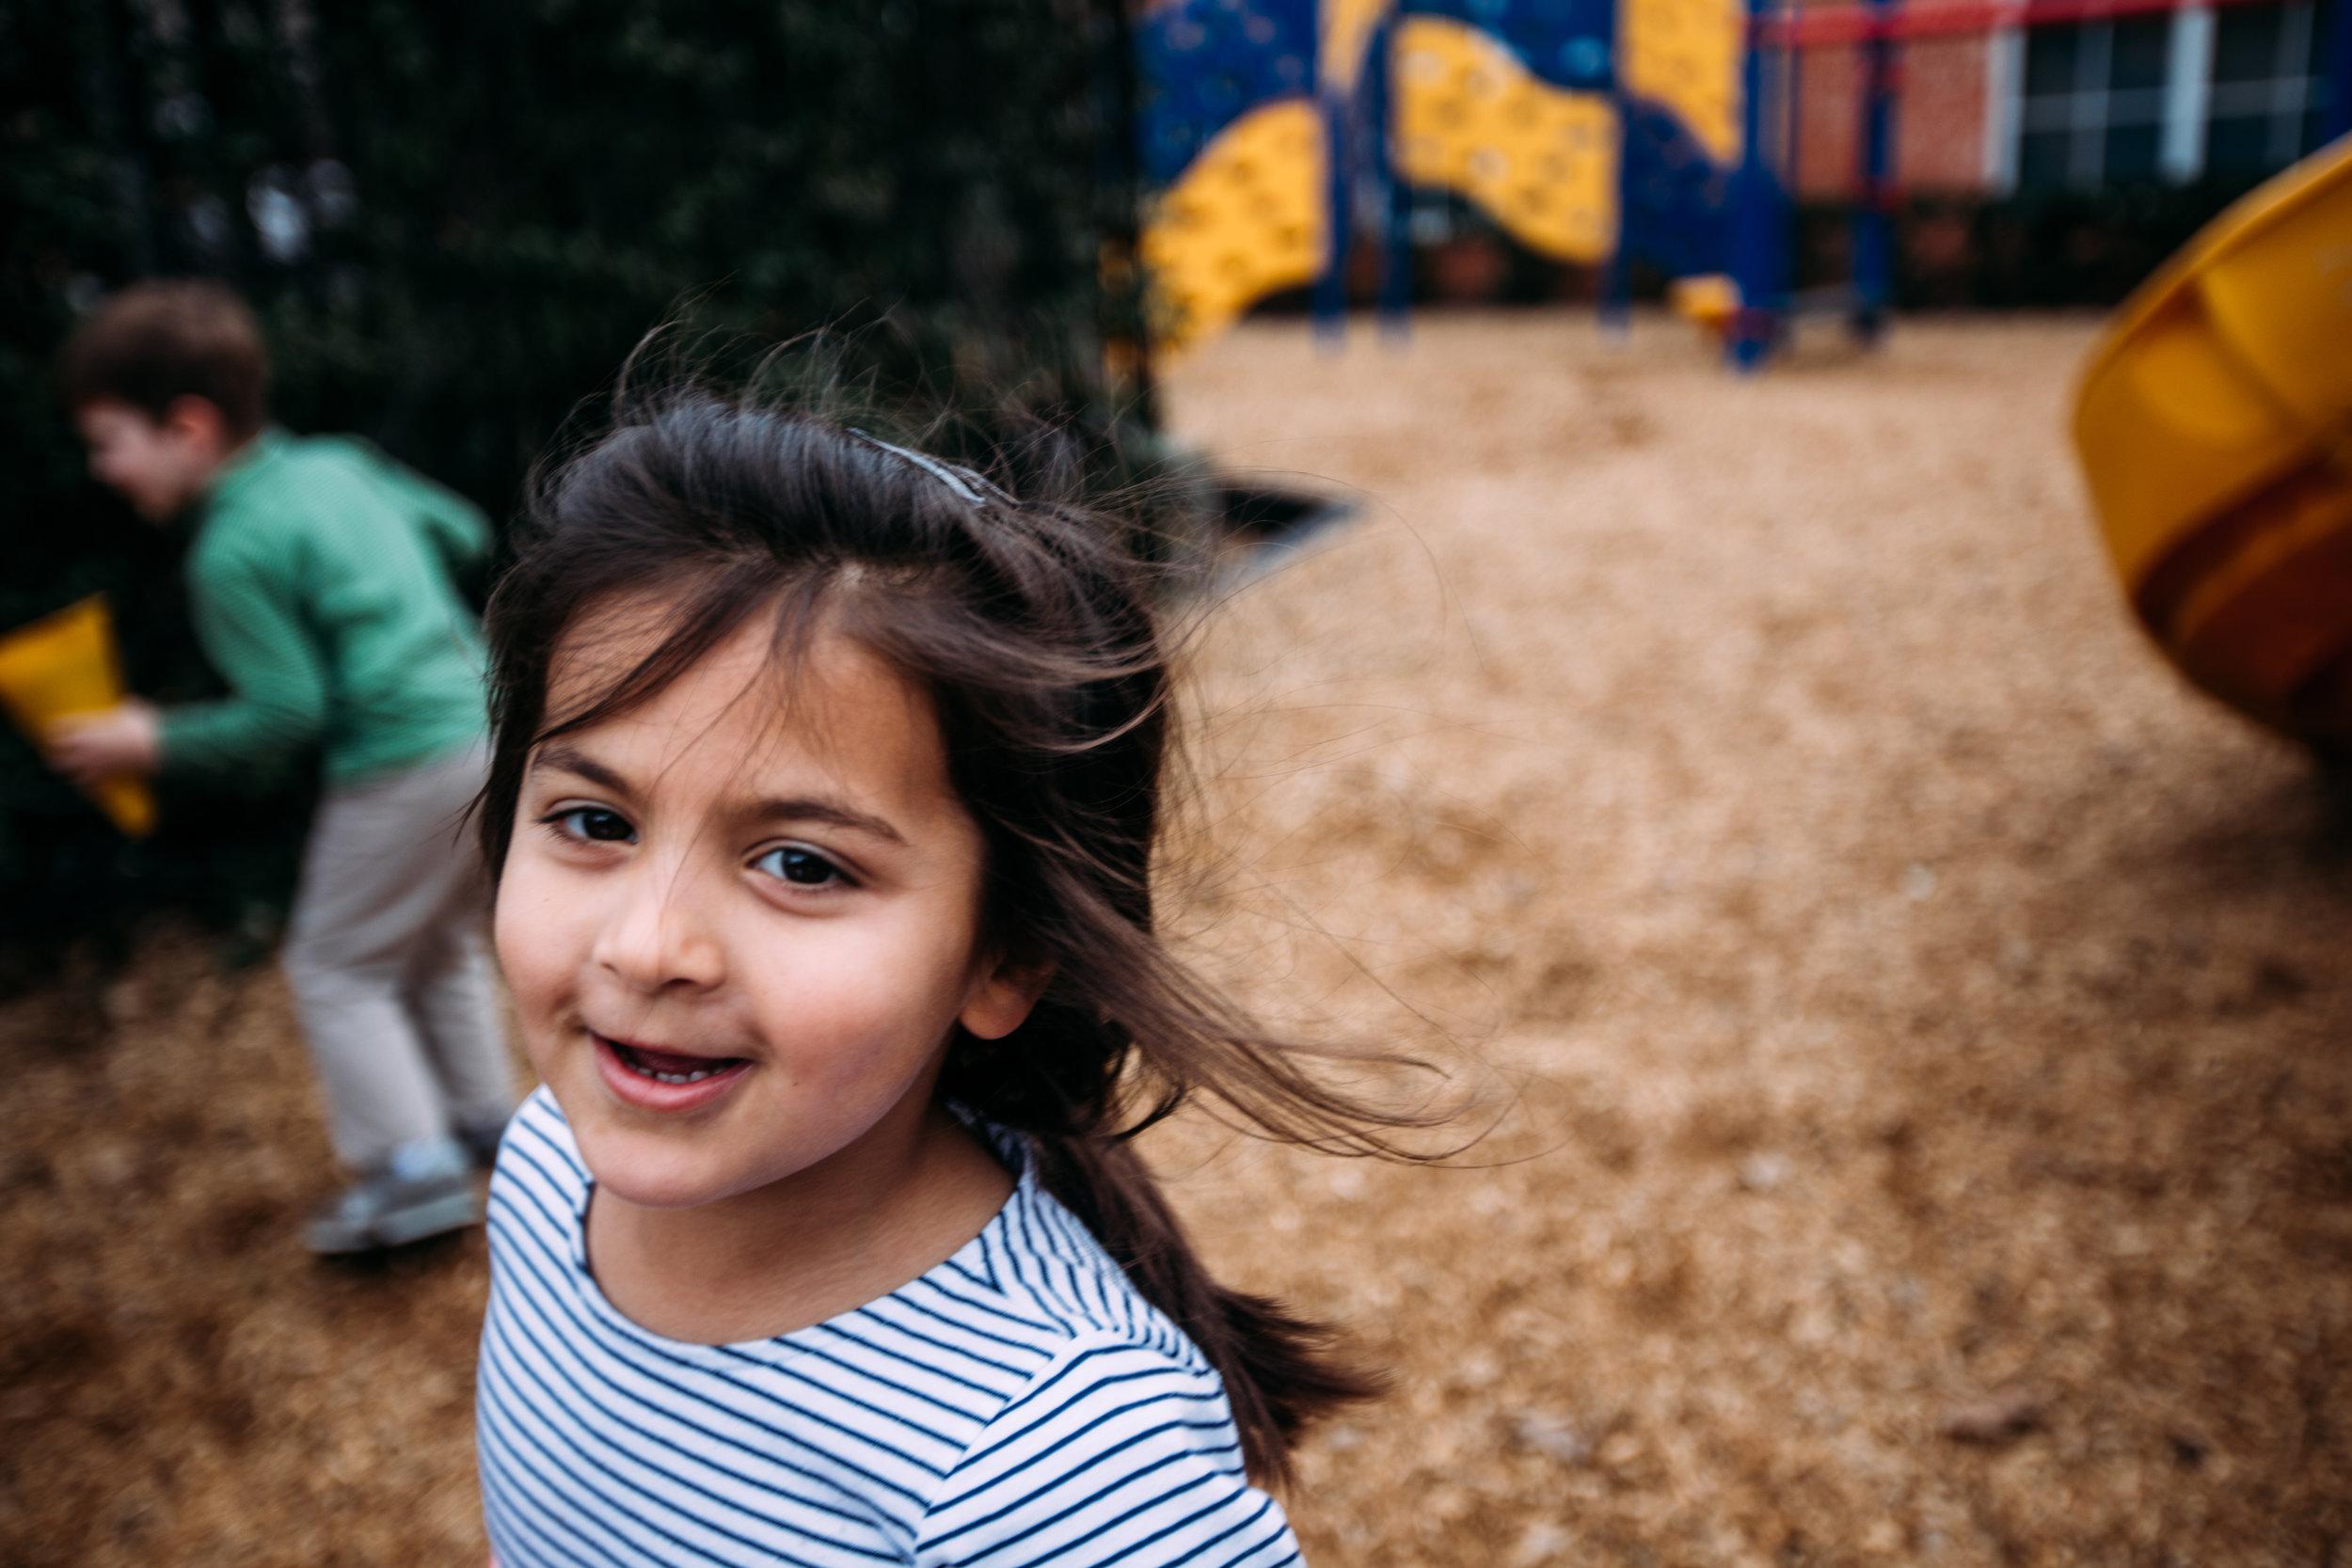 Houston School Photography - PreK River Oaks Baptist School-1-2.jpg